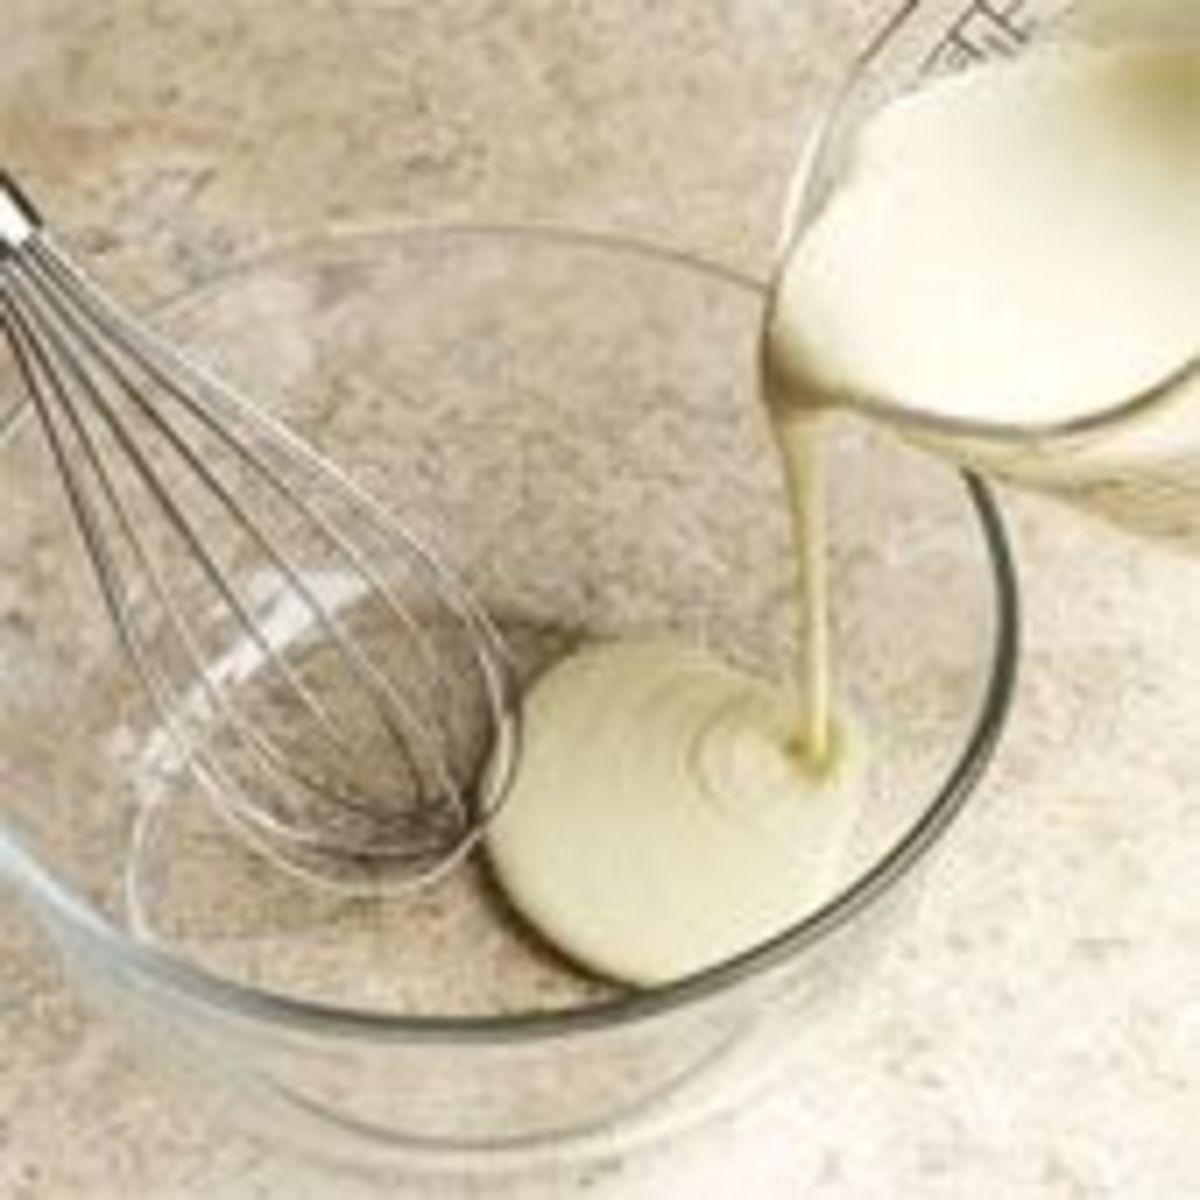 My favorite paper mache paste recipe feltmagnet for Paper mache ingredients